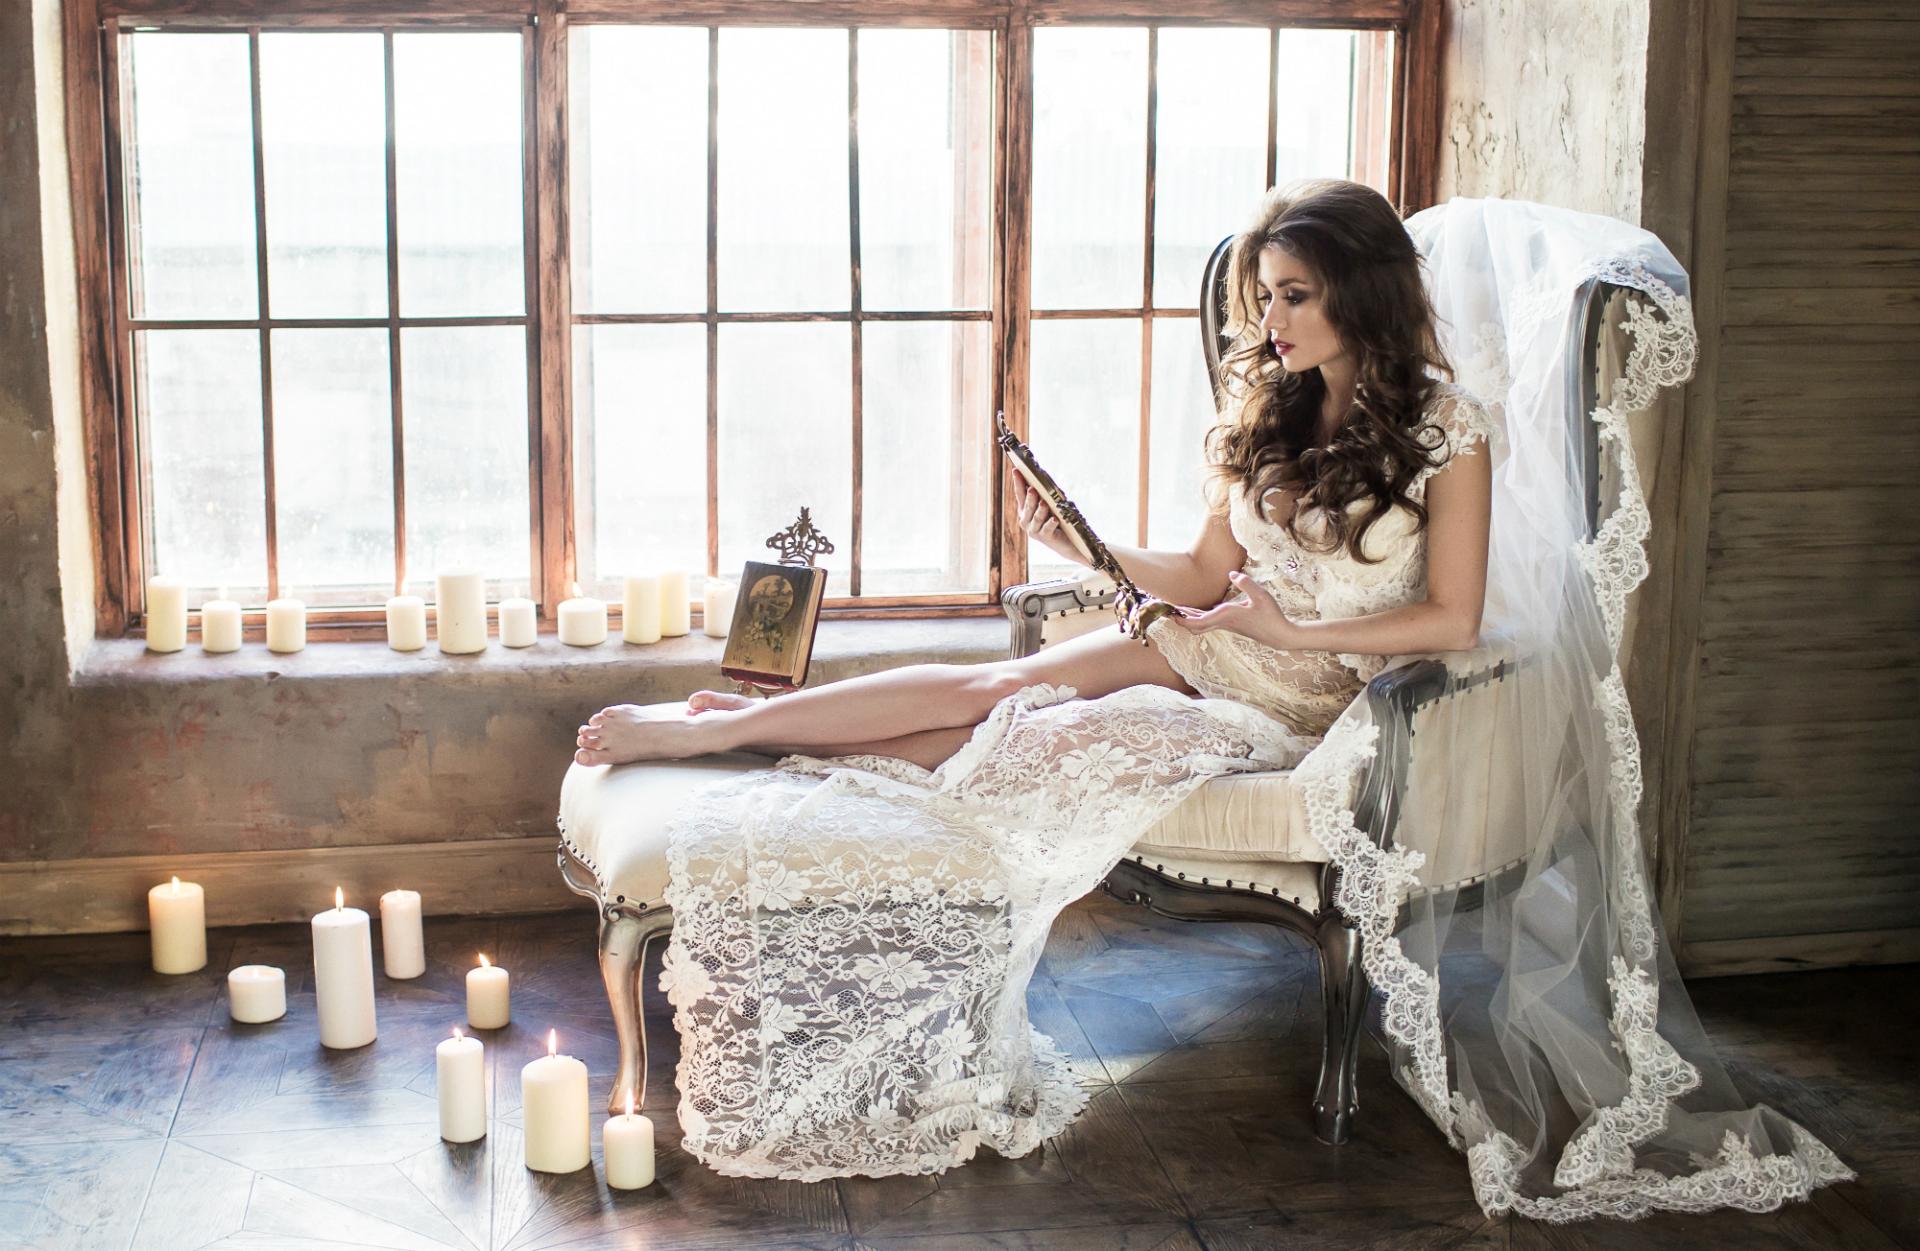 Фото невеста в кресле